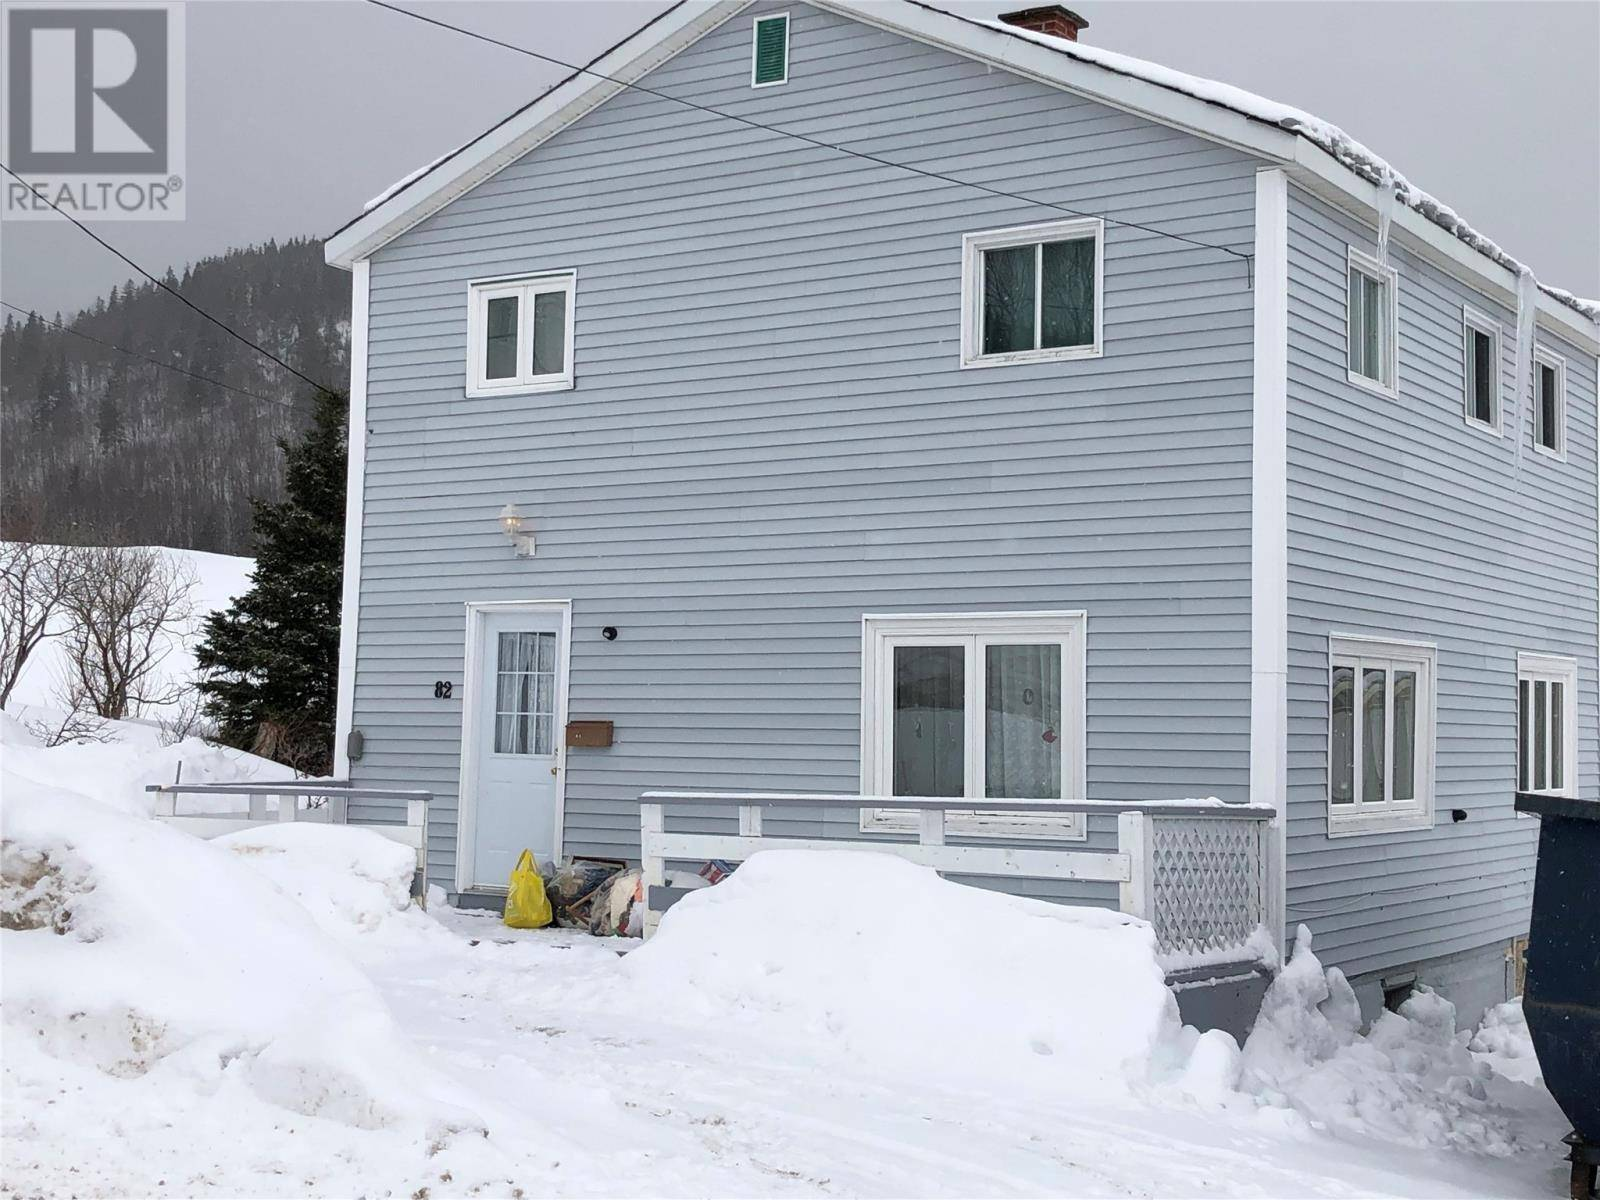 House for sale at 82 Bayview Ht Corner Brook Newfoundland - MLS: 1212413